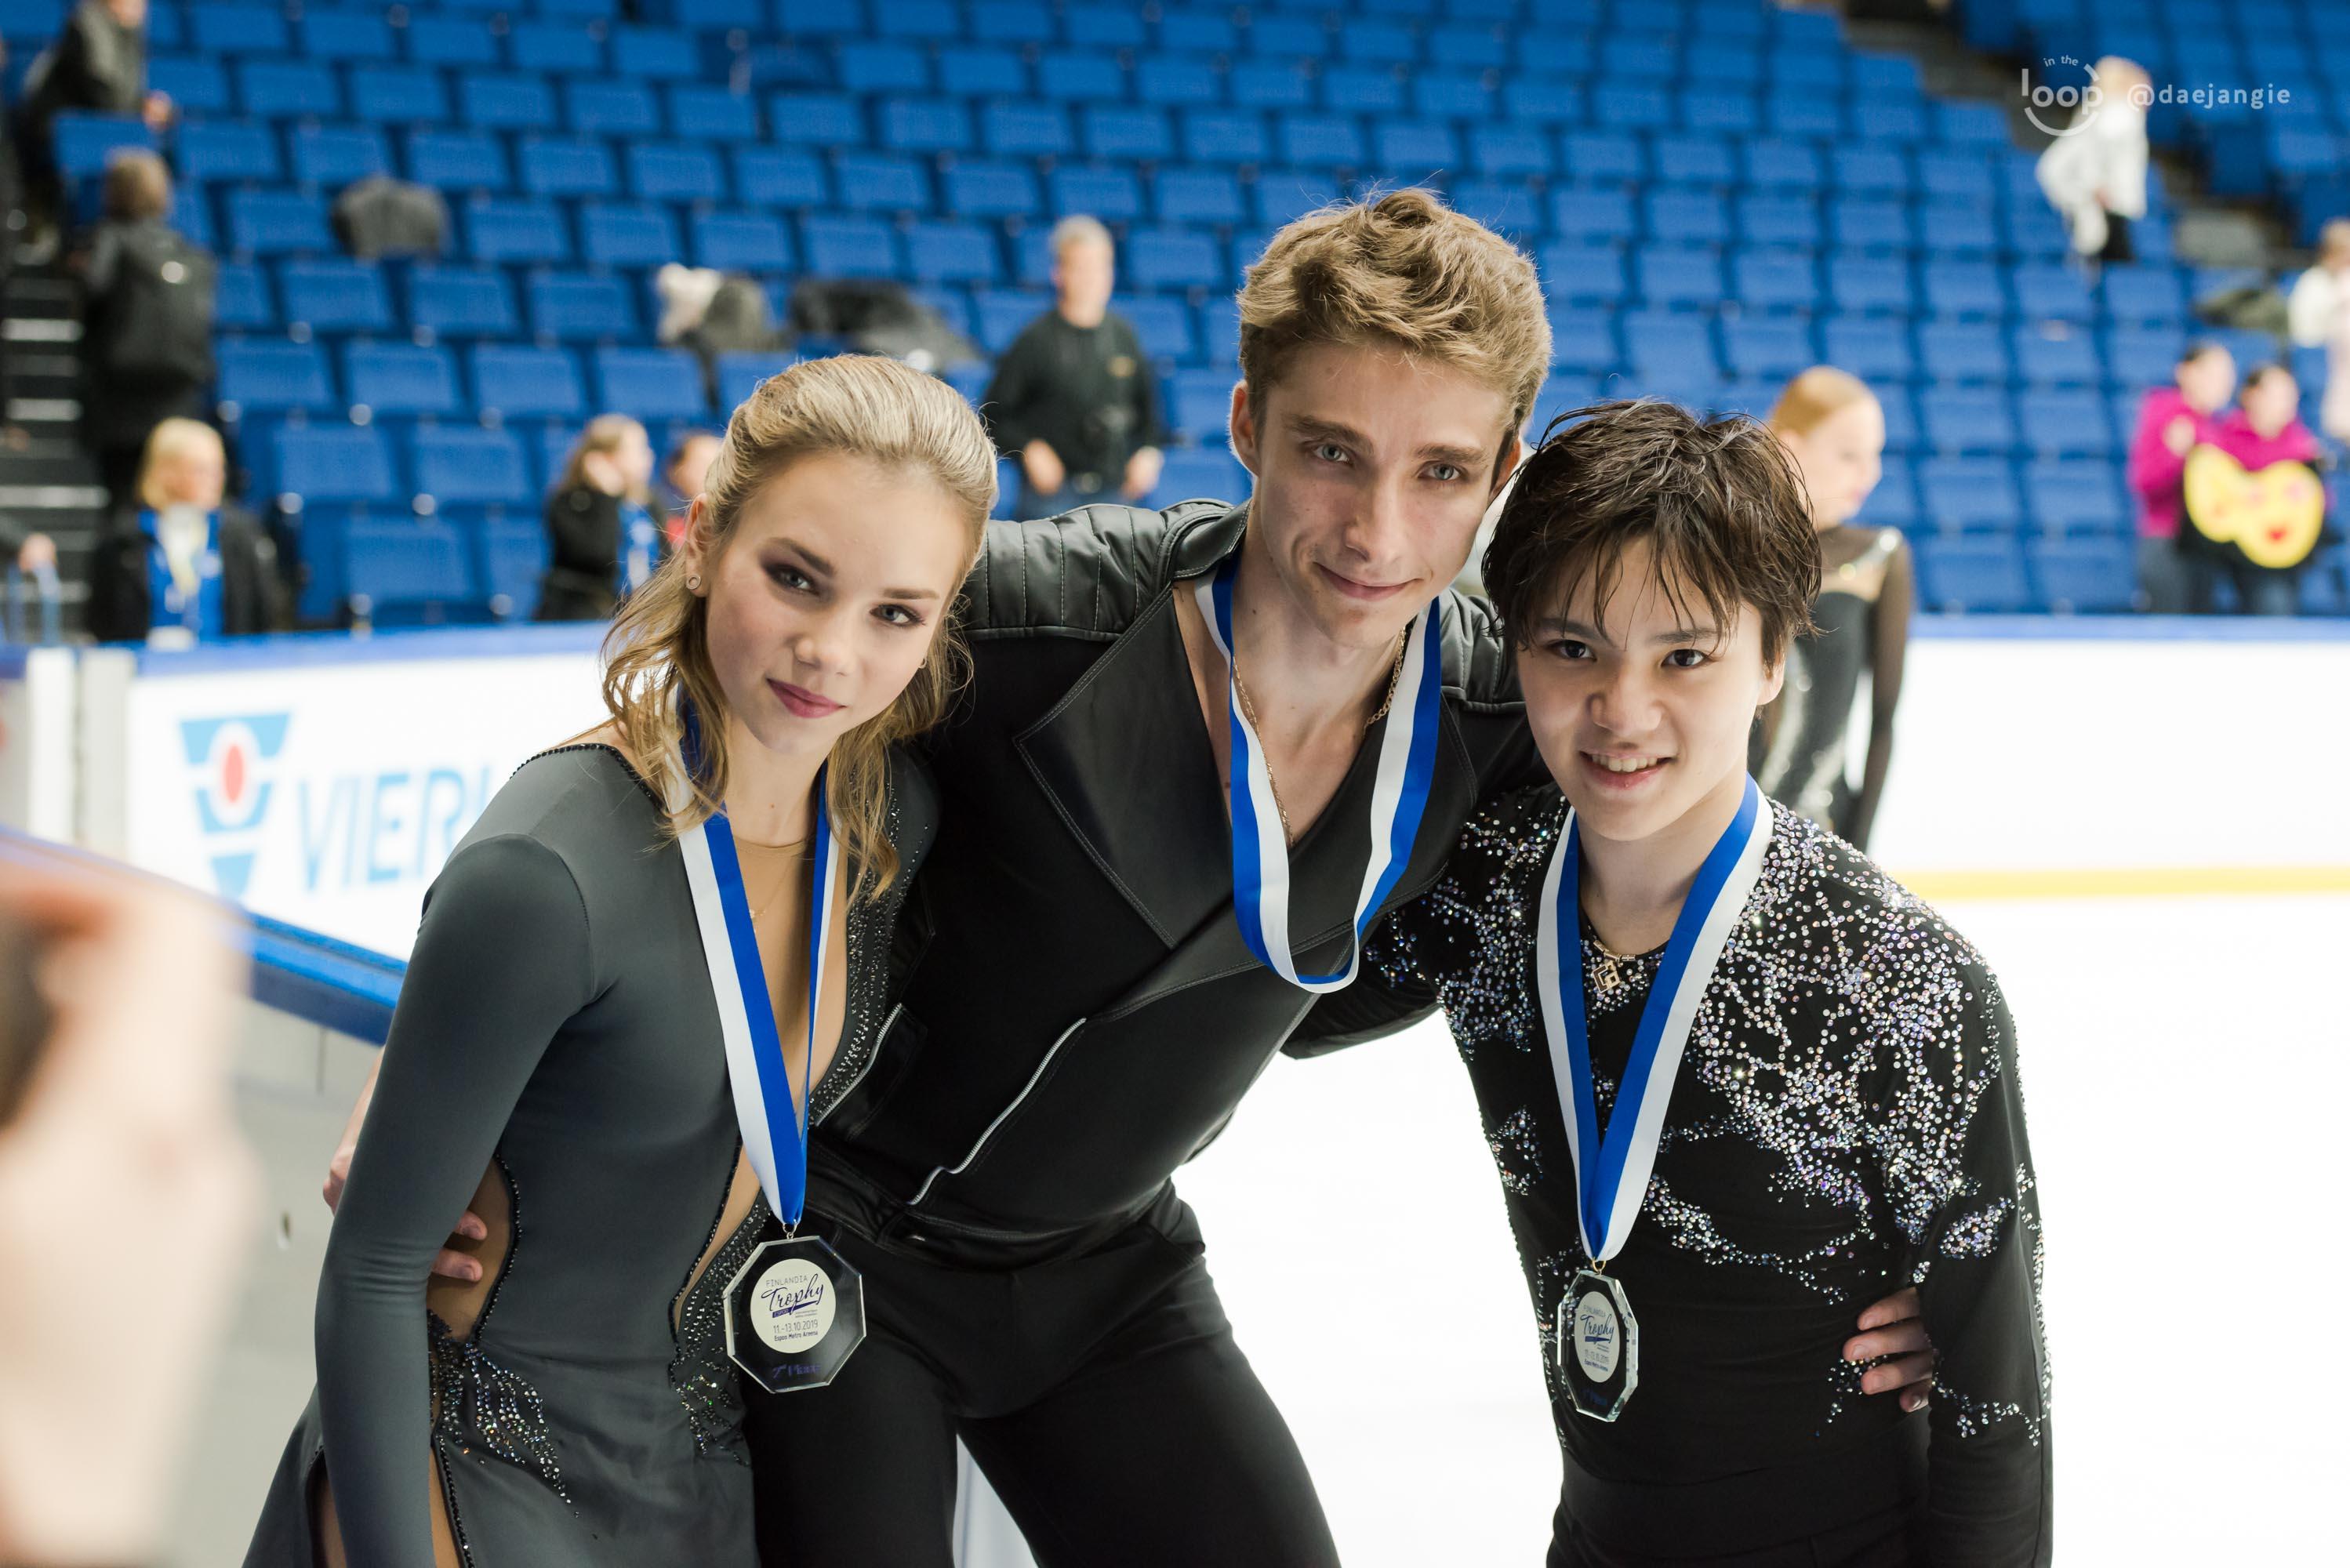 Challenger (6) - Finlandia Trophy. Oct 11 - 13, 2019. Espoo /FIN      - Страница 10 EGvaWkMW4AAcBA_?format=jpg&name=4096x4096